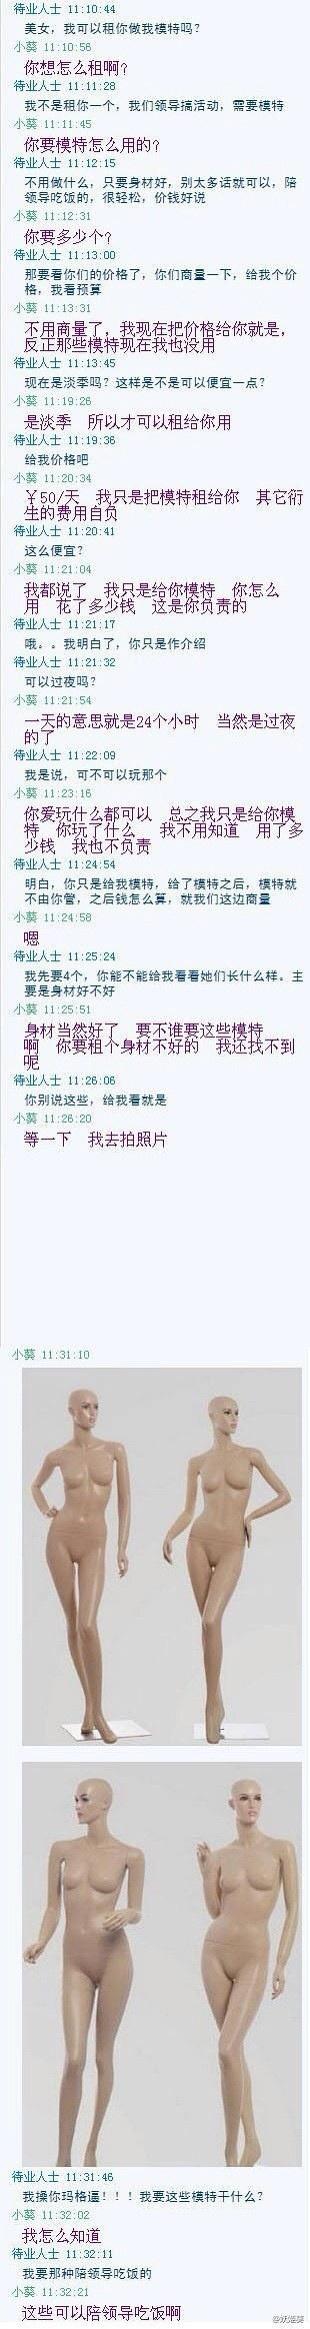 http://static.oschina.net/uploads/space/2015/1009/144153_EdQ2_31384.jpg